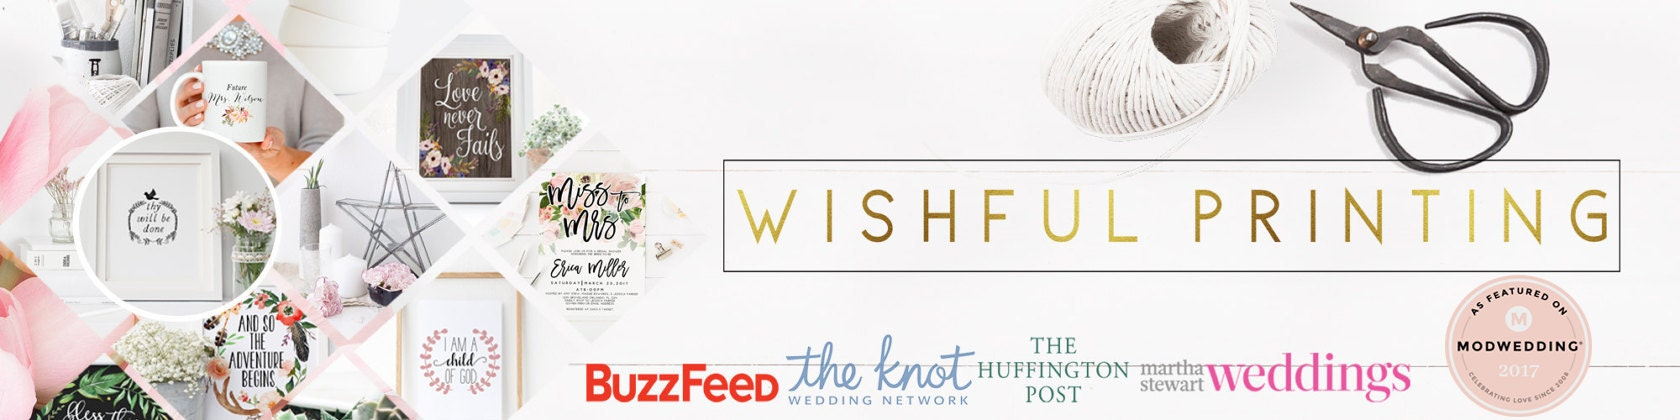 Wedding Totes Modern Invitations Printables By Wishfulprinting